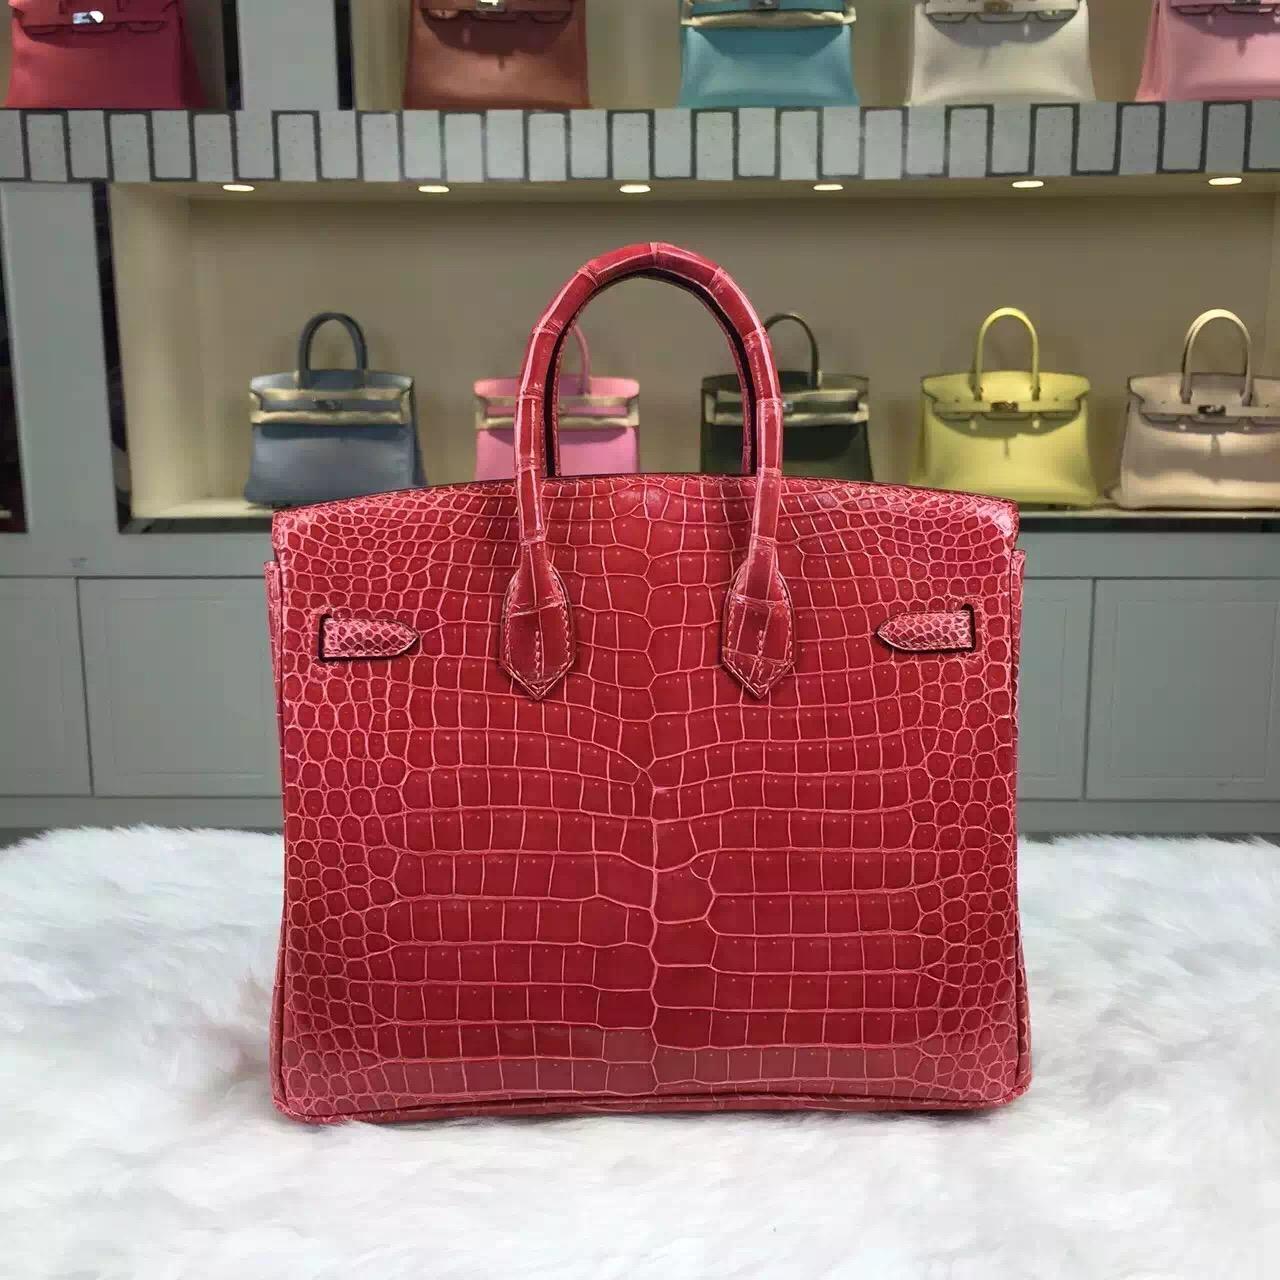 Customised Hermes 5L Prawn Pink Crocodile Shiny Leather Birkin Bag25cm Gold Hardware